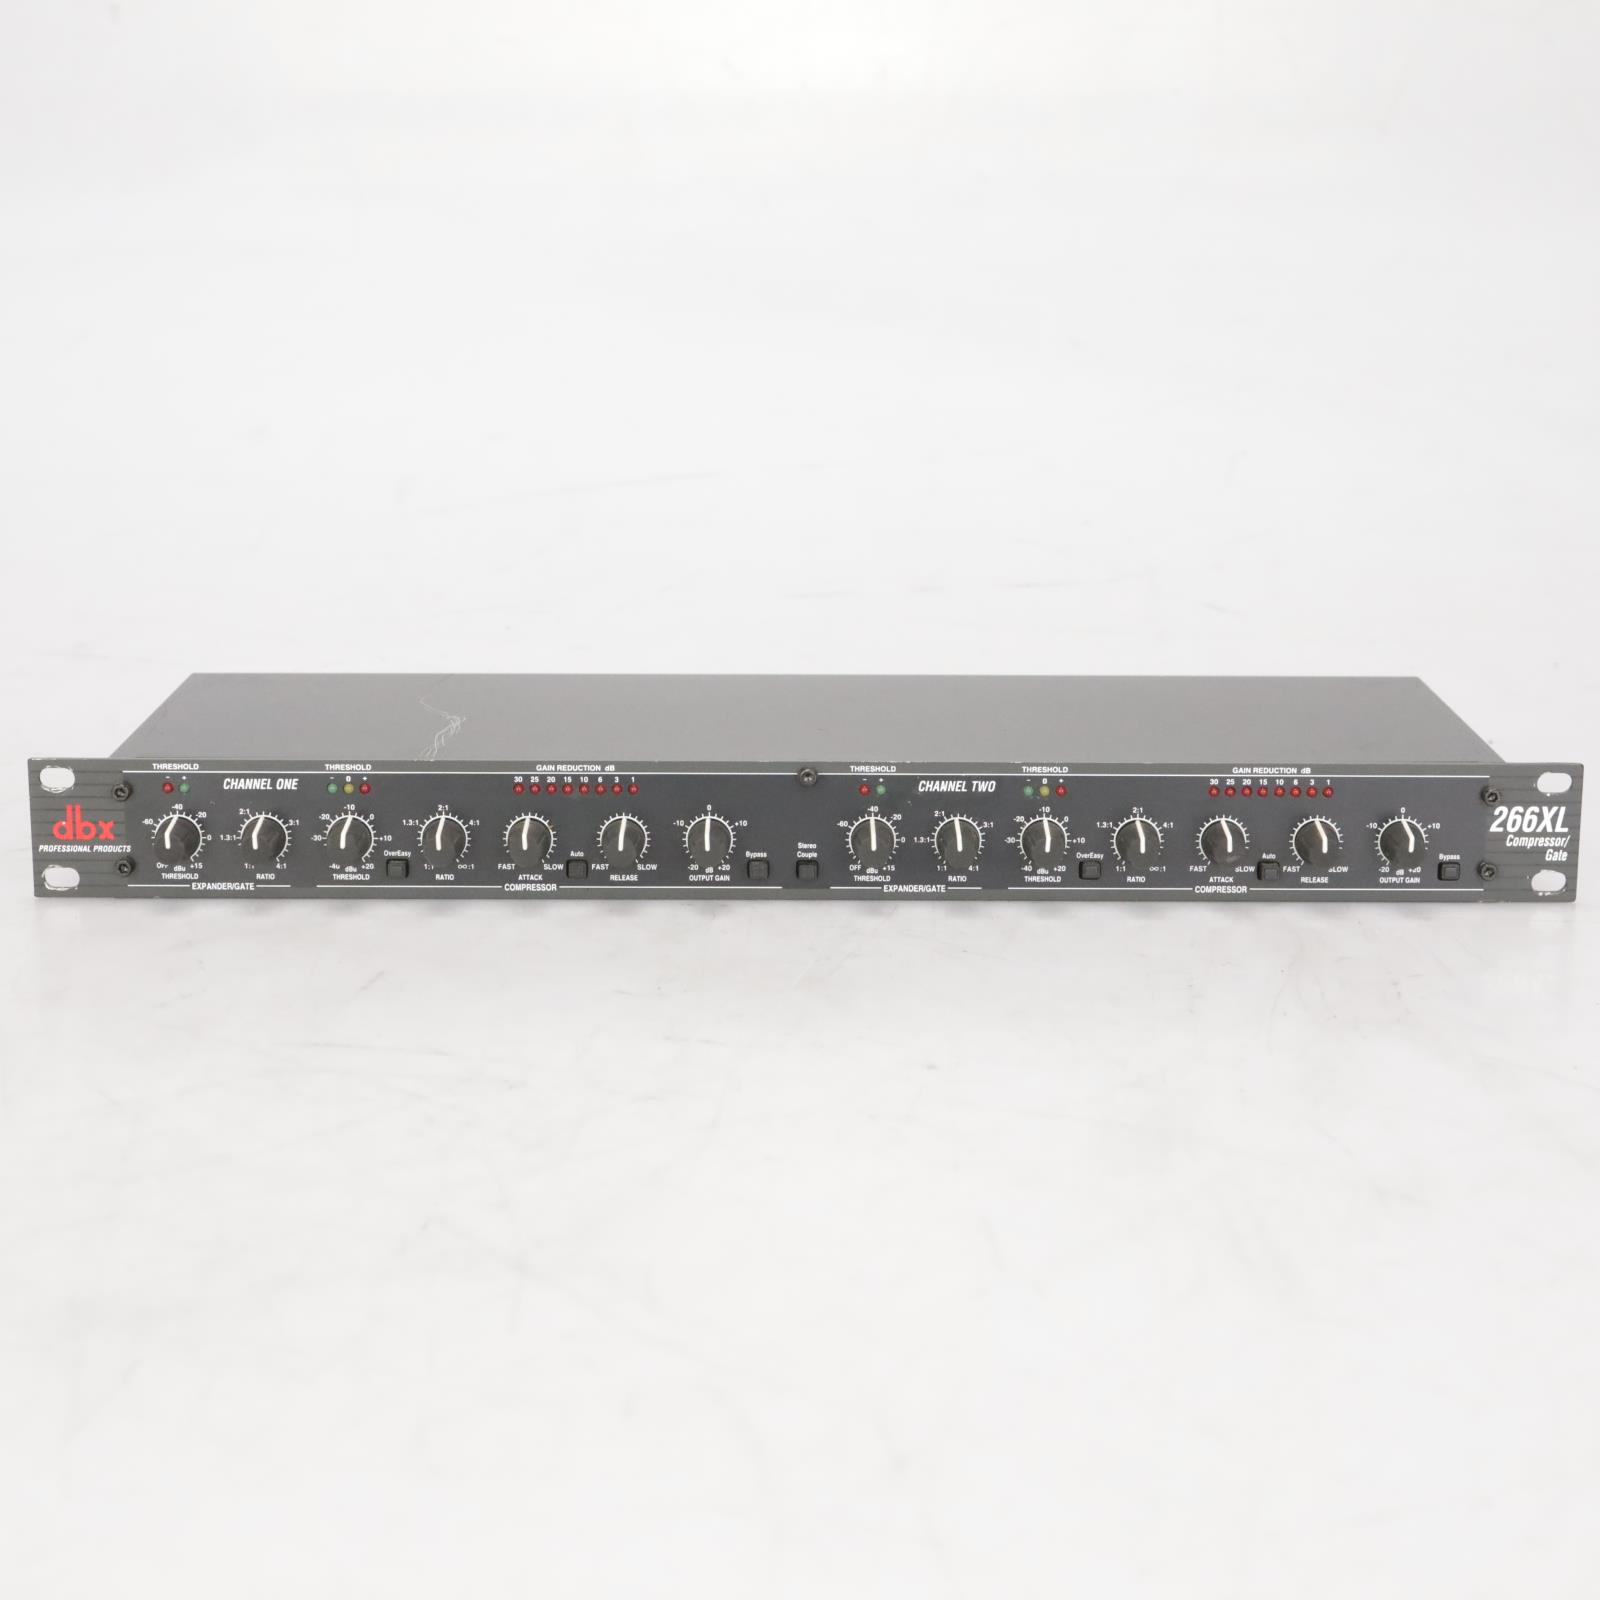 dbx 266XL 2-Channel Compressor Gate Expander Sidechain Insert Dynamics #38400